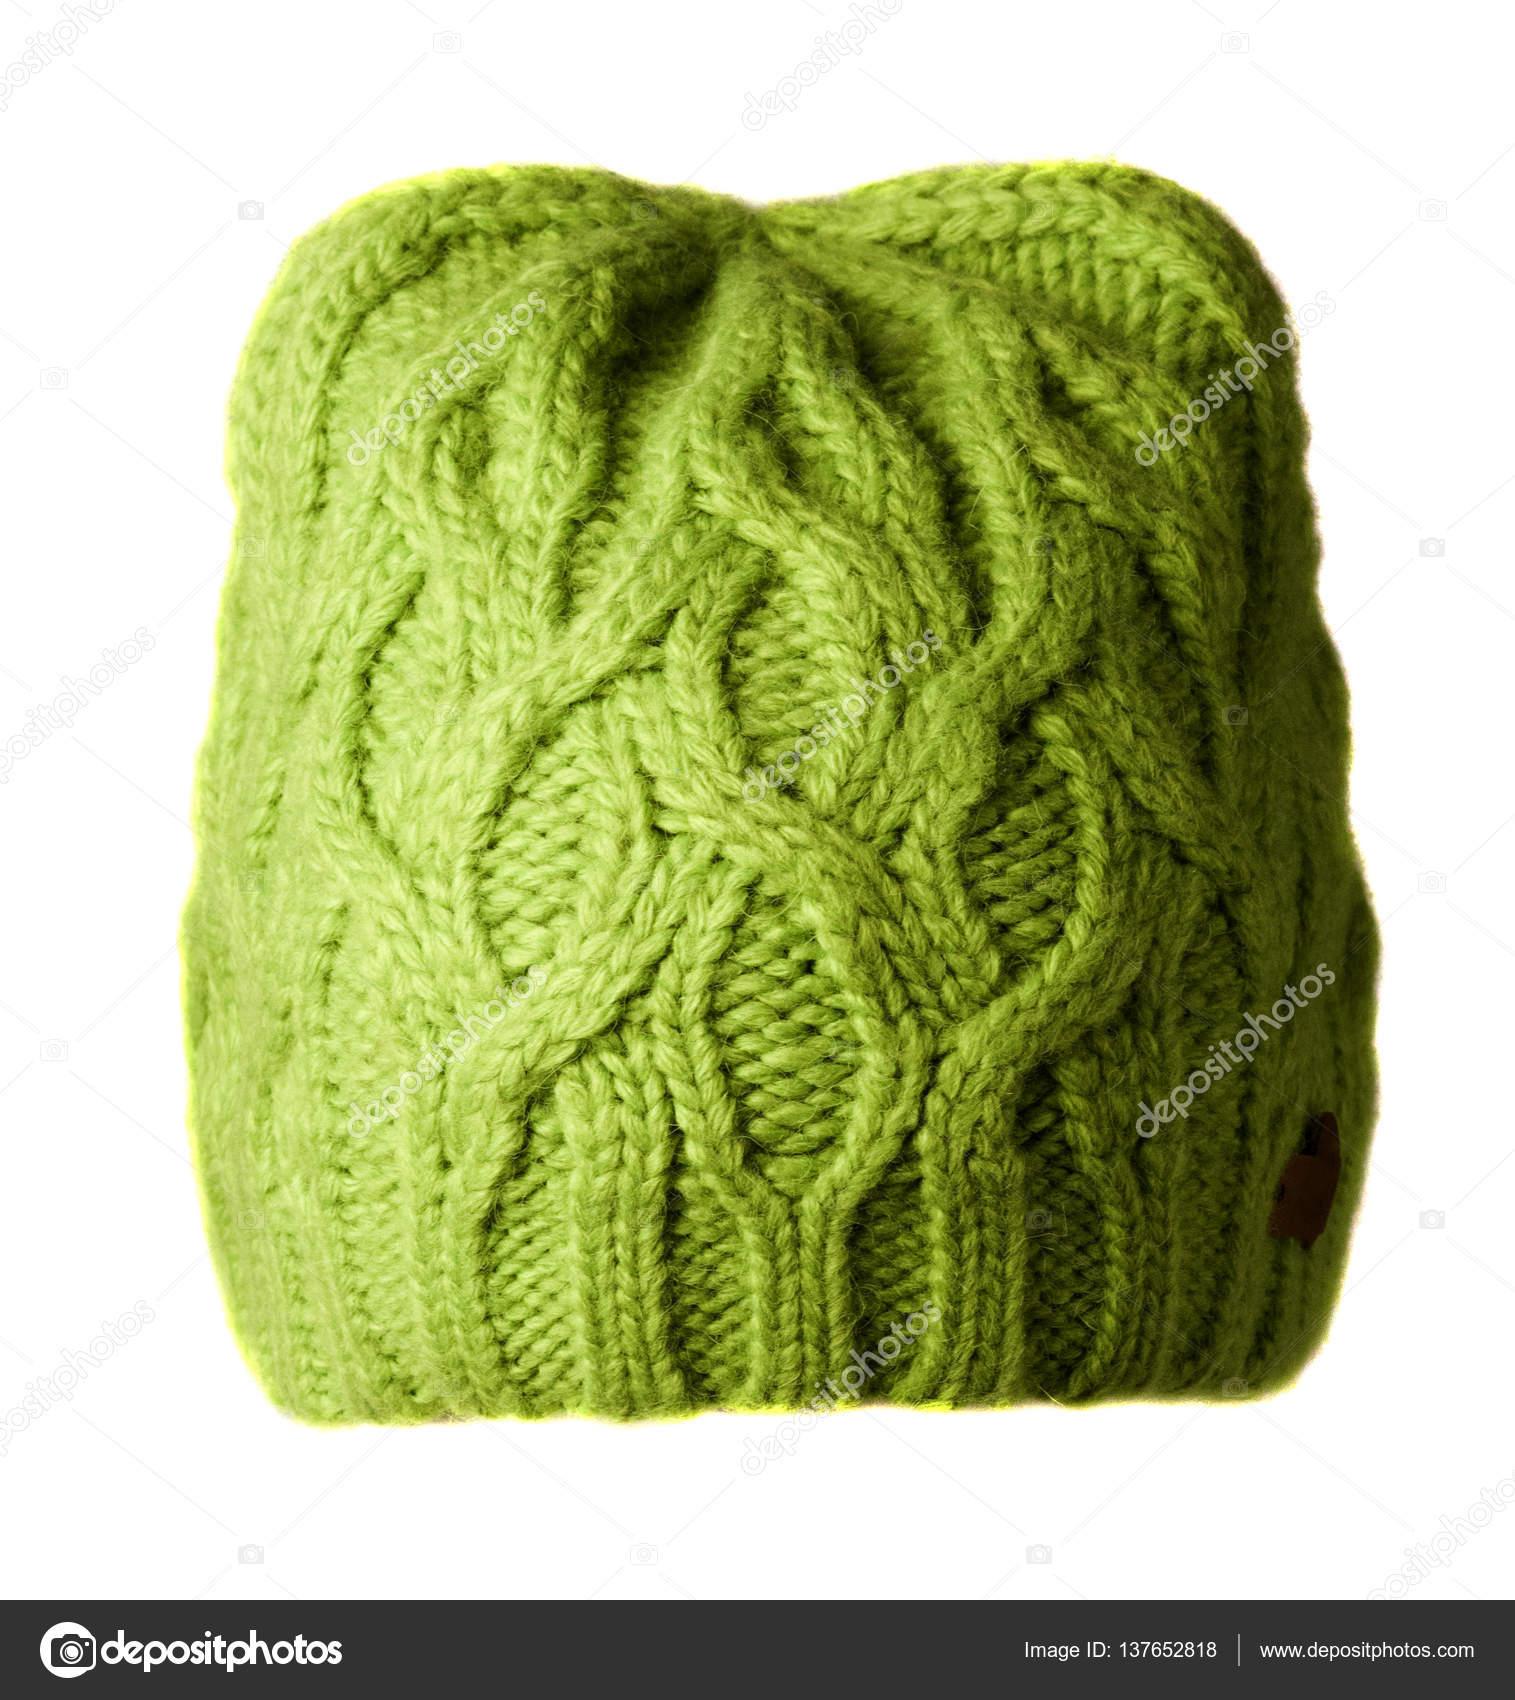 dcf1e9d69453 Γυναικείο καπέλο. πλεκτό καπέλο που απομονώνονται σε λευκό πράσινο  background.light καπέλο — Εικόνα από ...